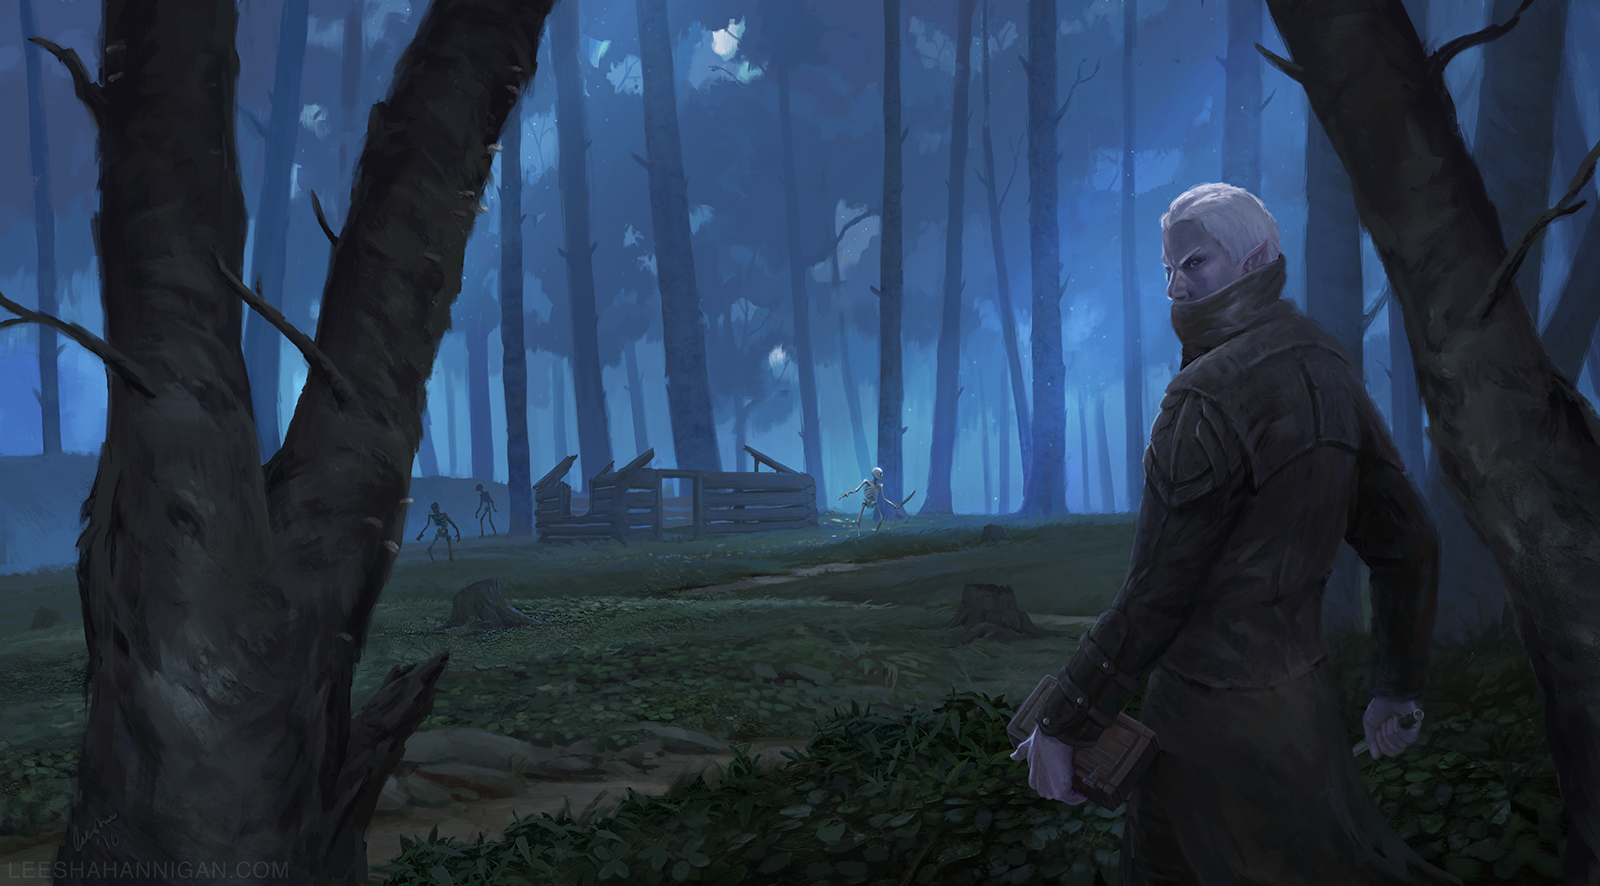 Leesha-Hannigan-Kithicor-Forest